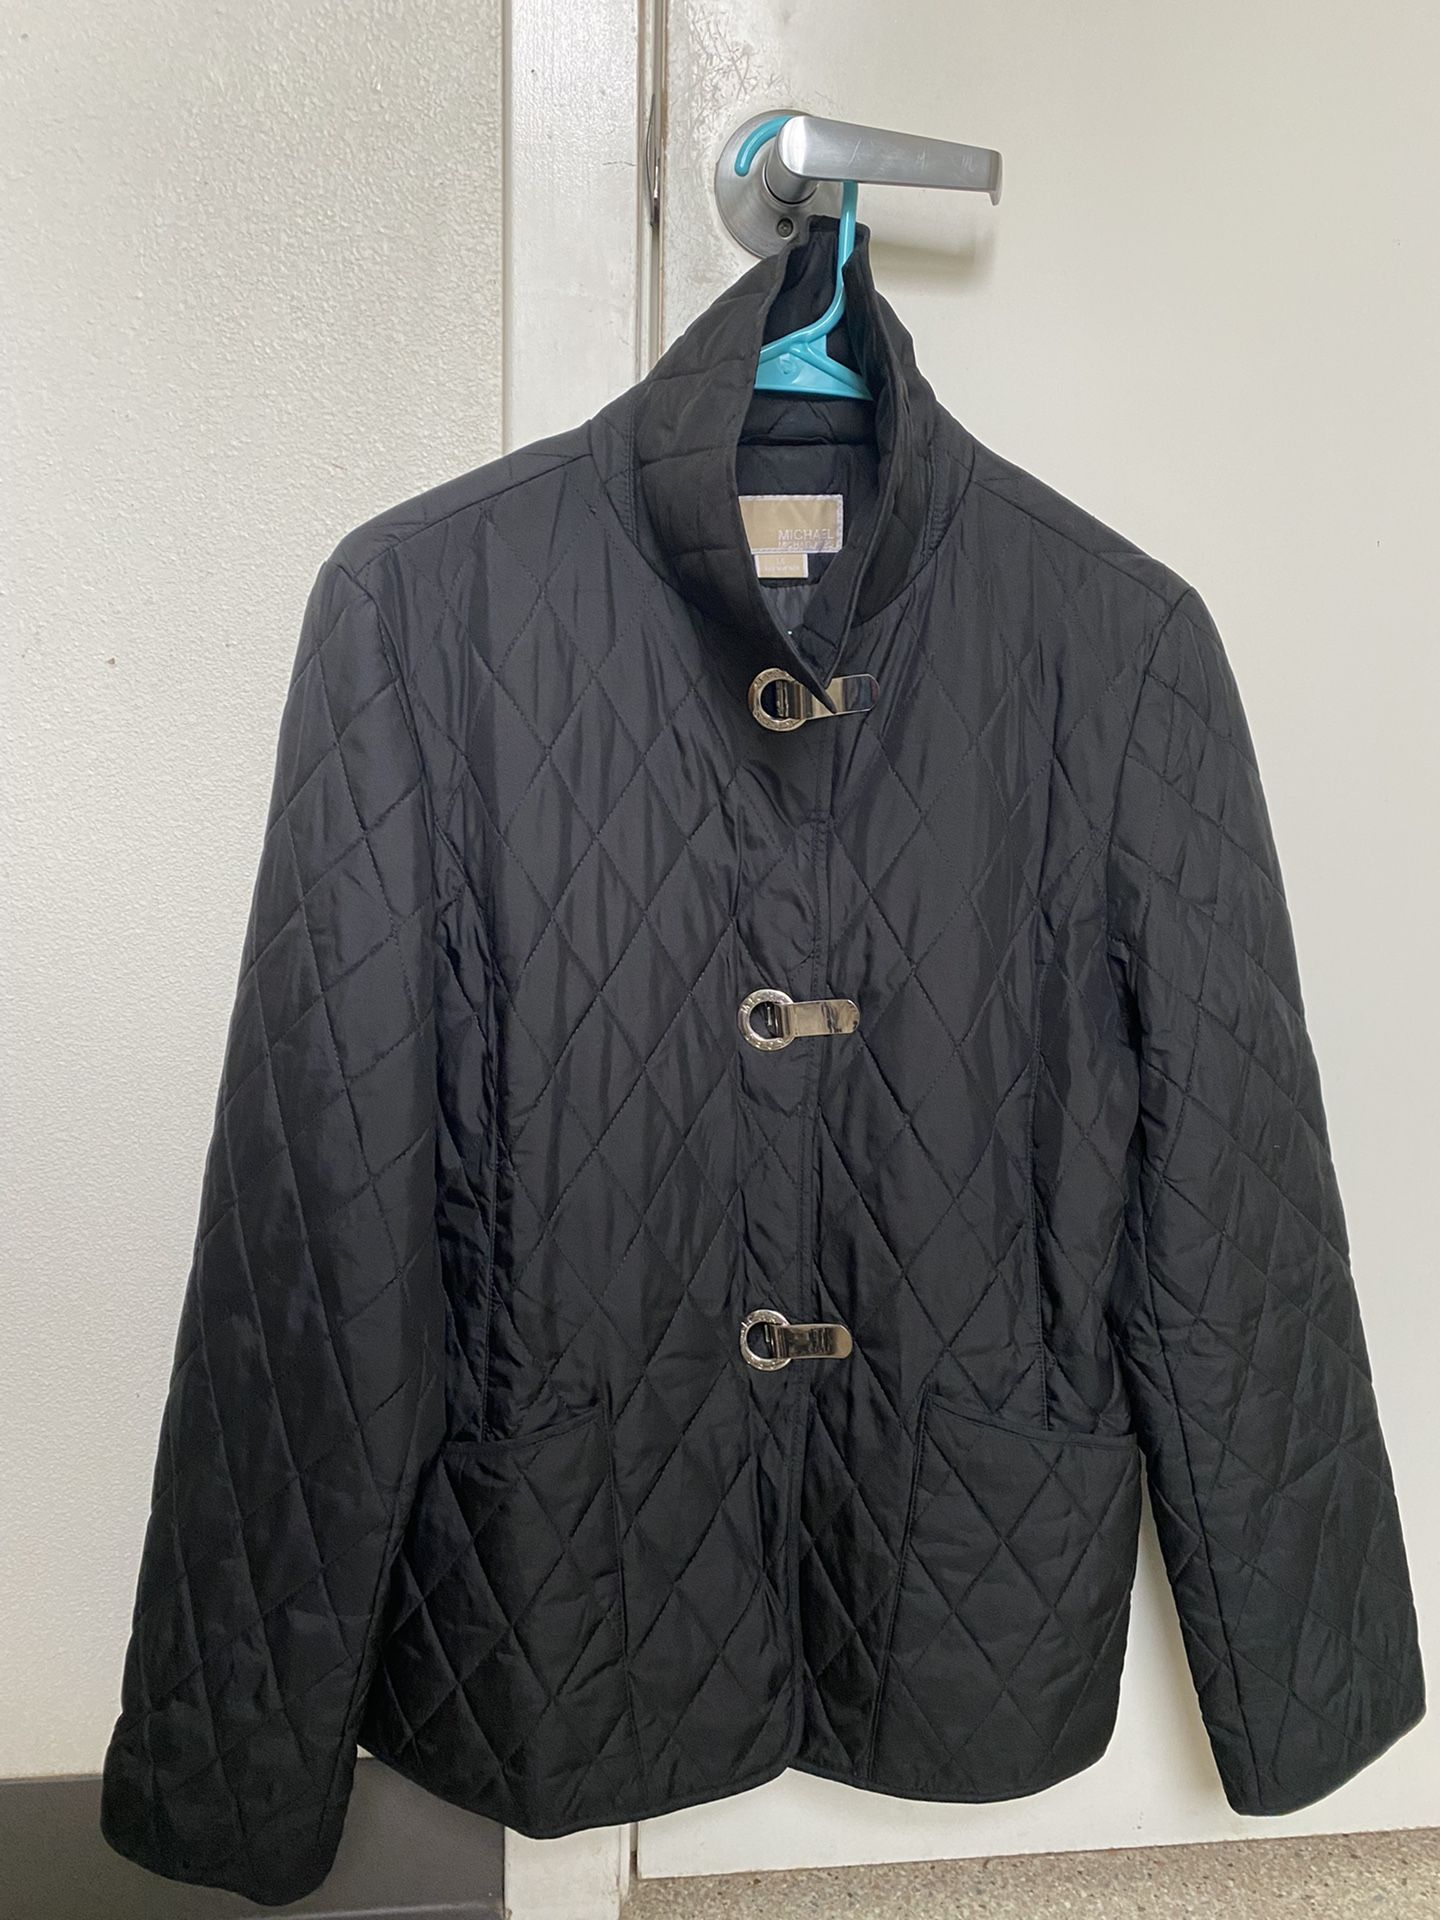 Michael Kors jacket size L/ G